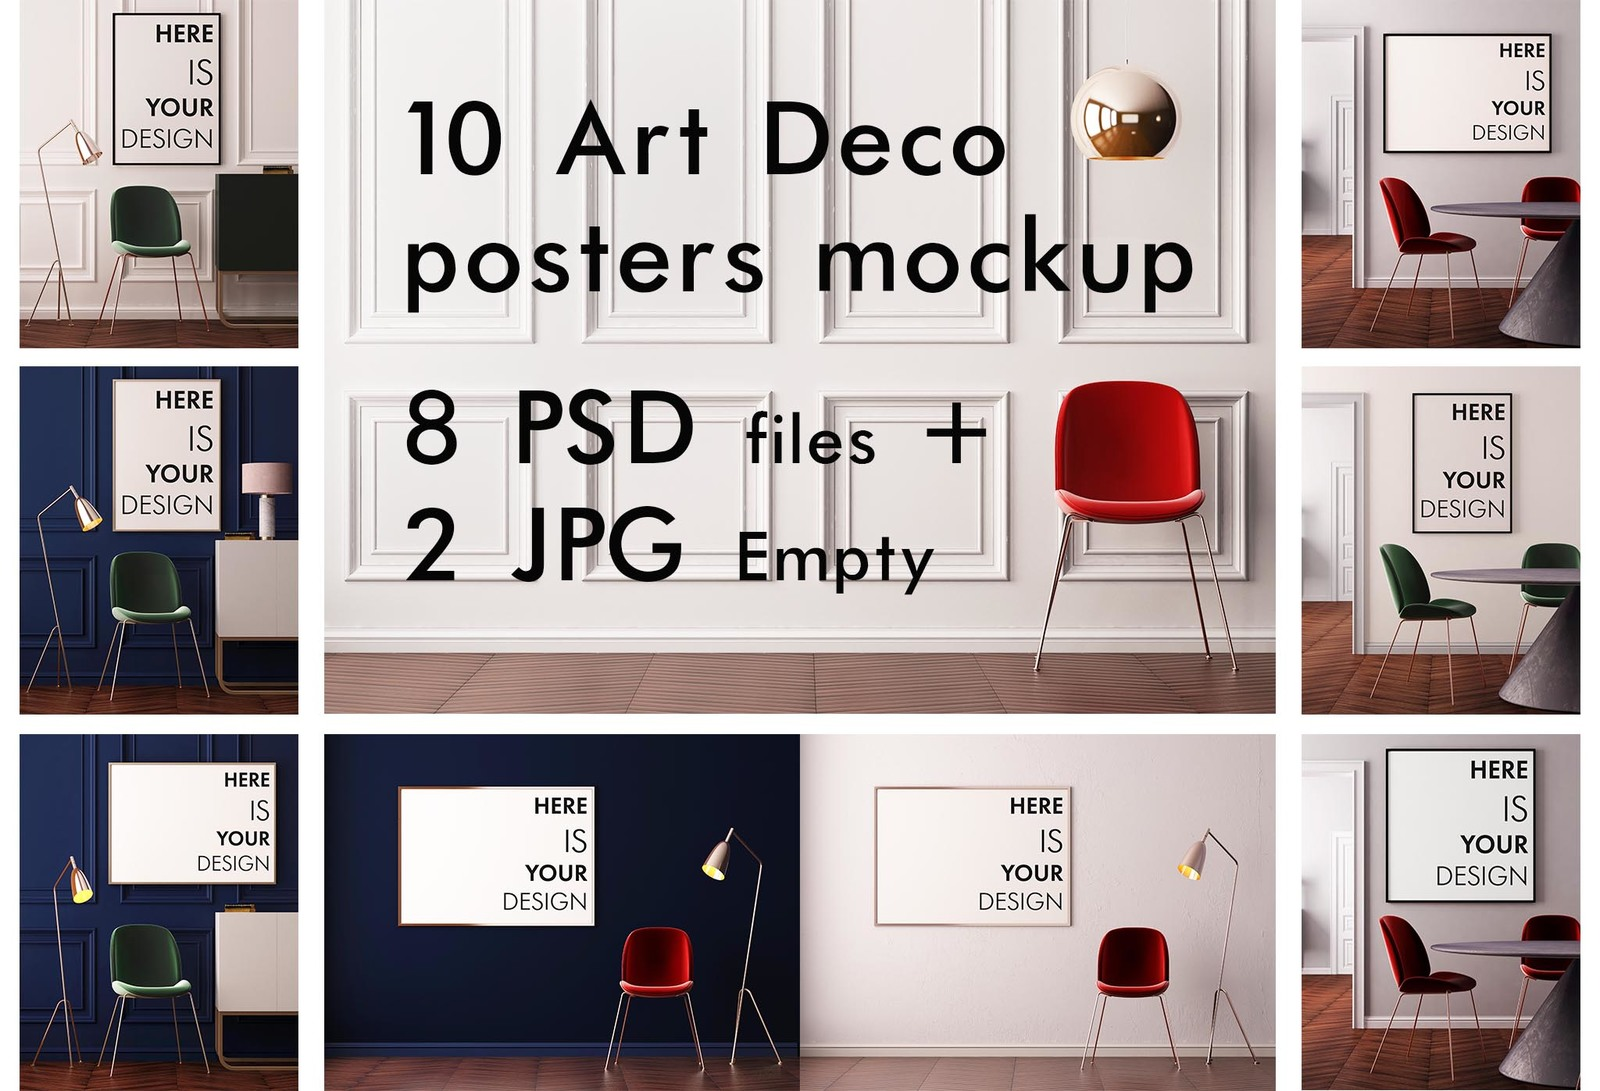 10 Art Deco posters mockup